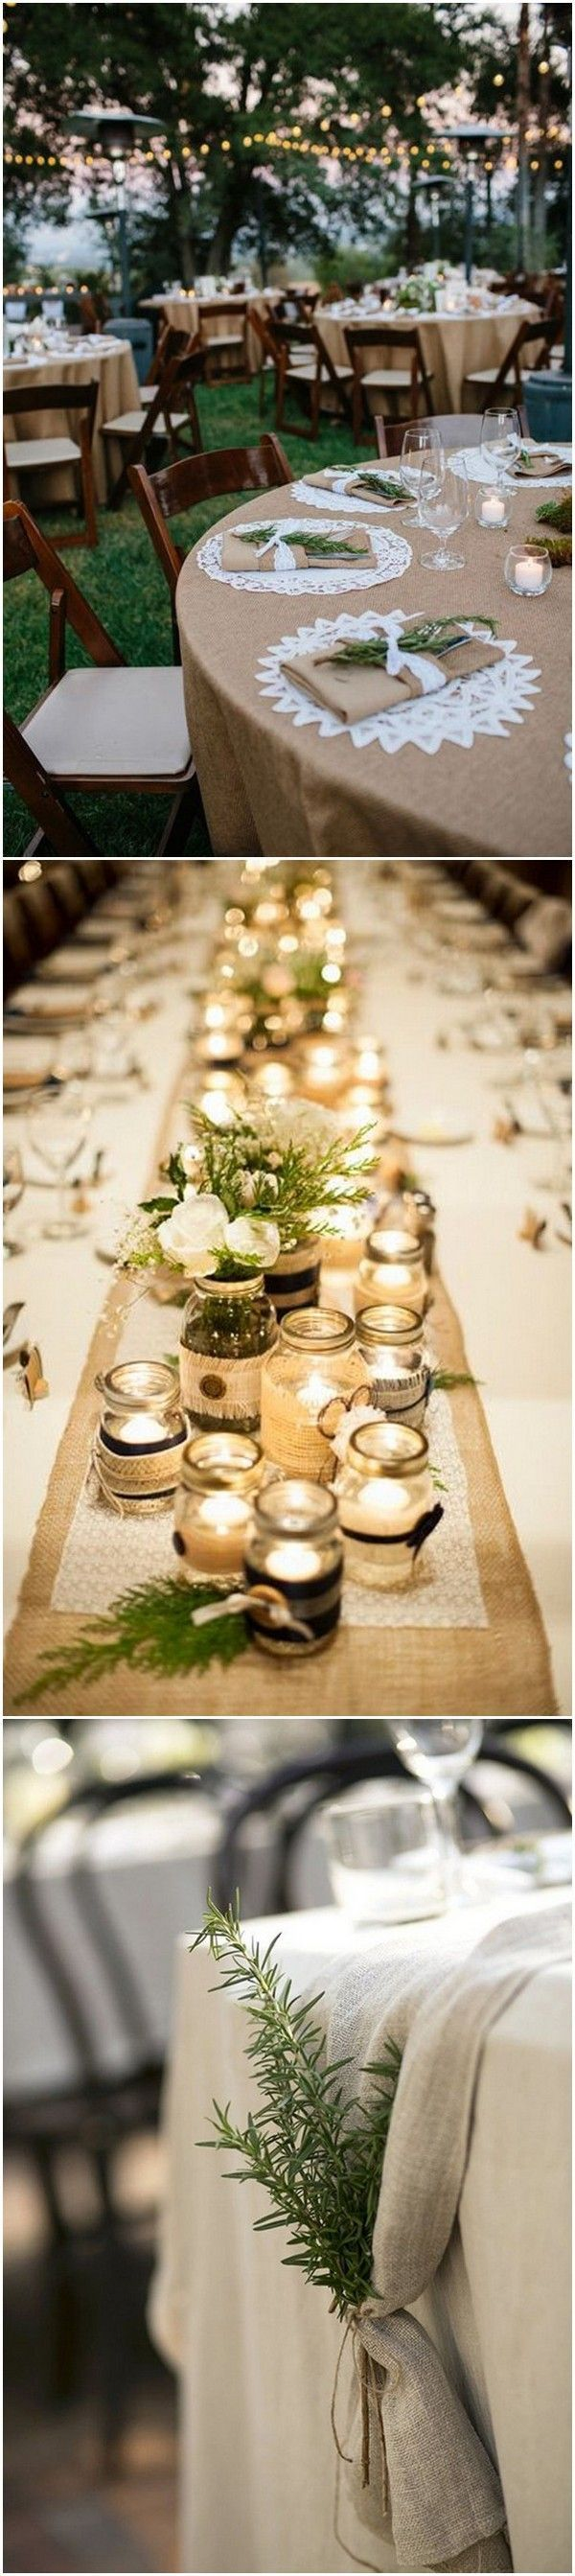 25 Best Ideas About Burlap Wedding Arch On Pinterest